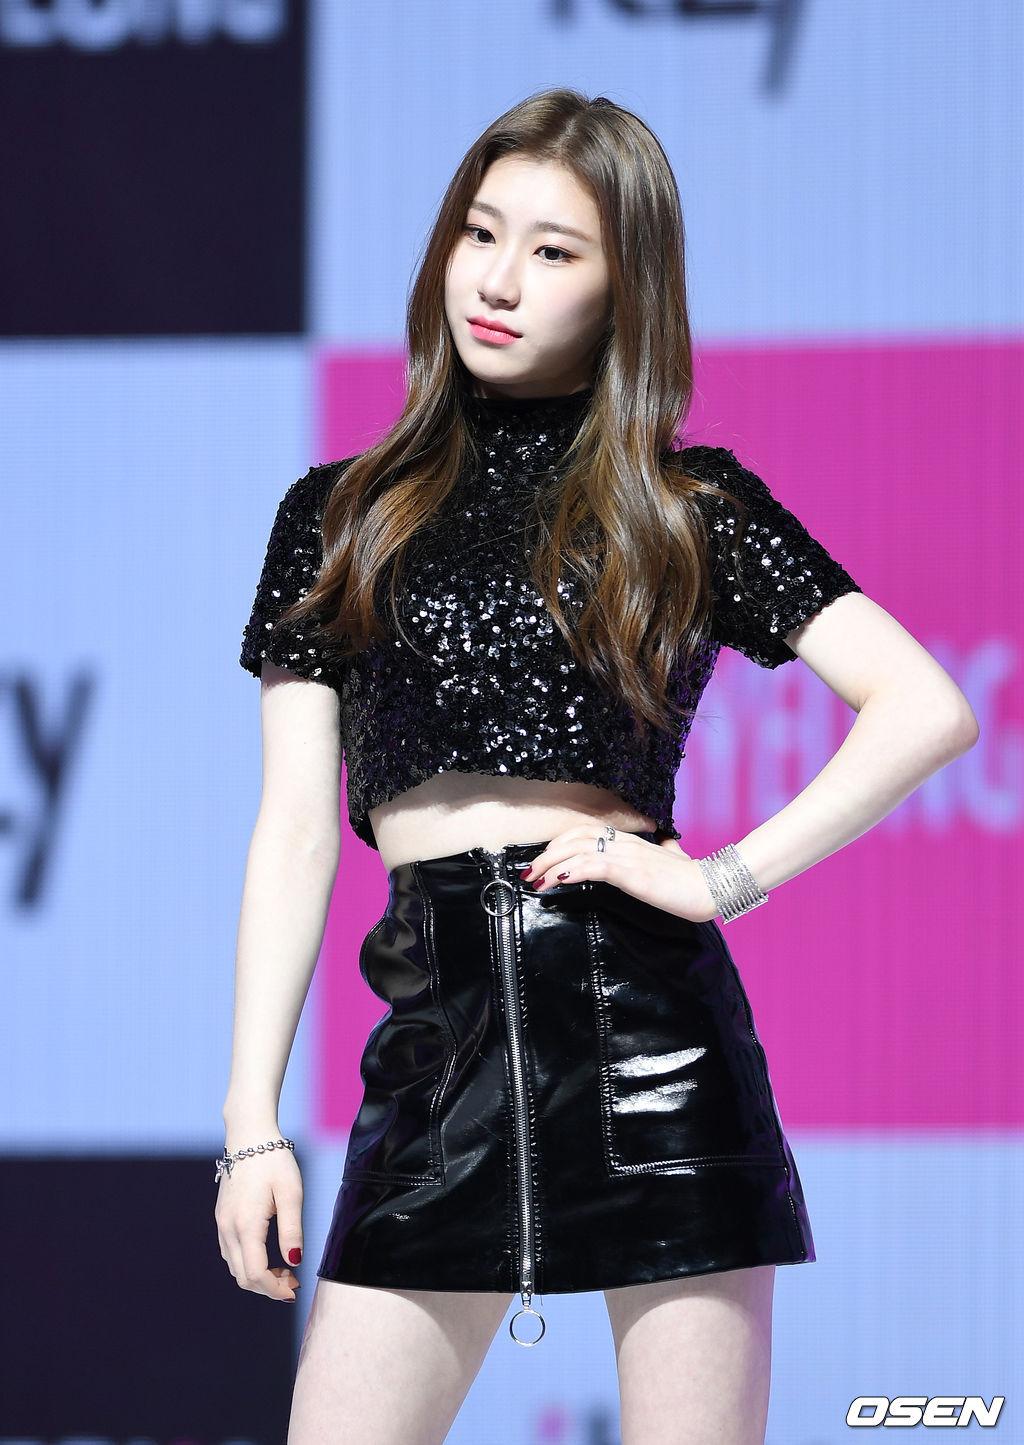 itzy chaeryeong